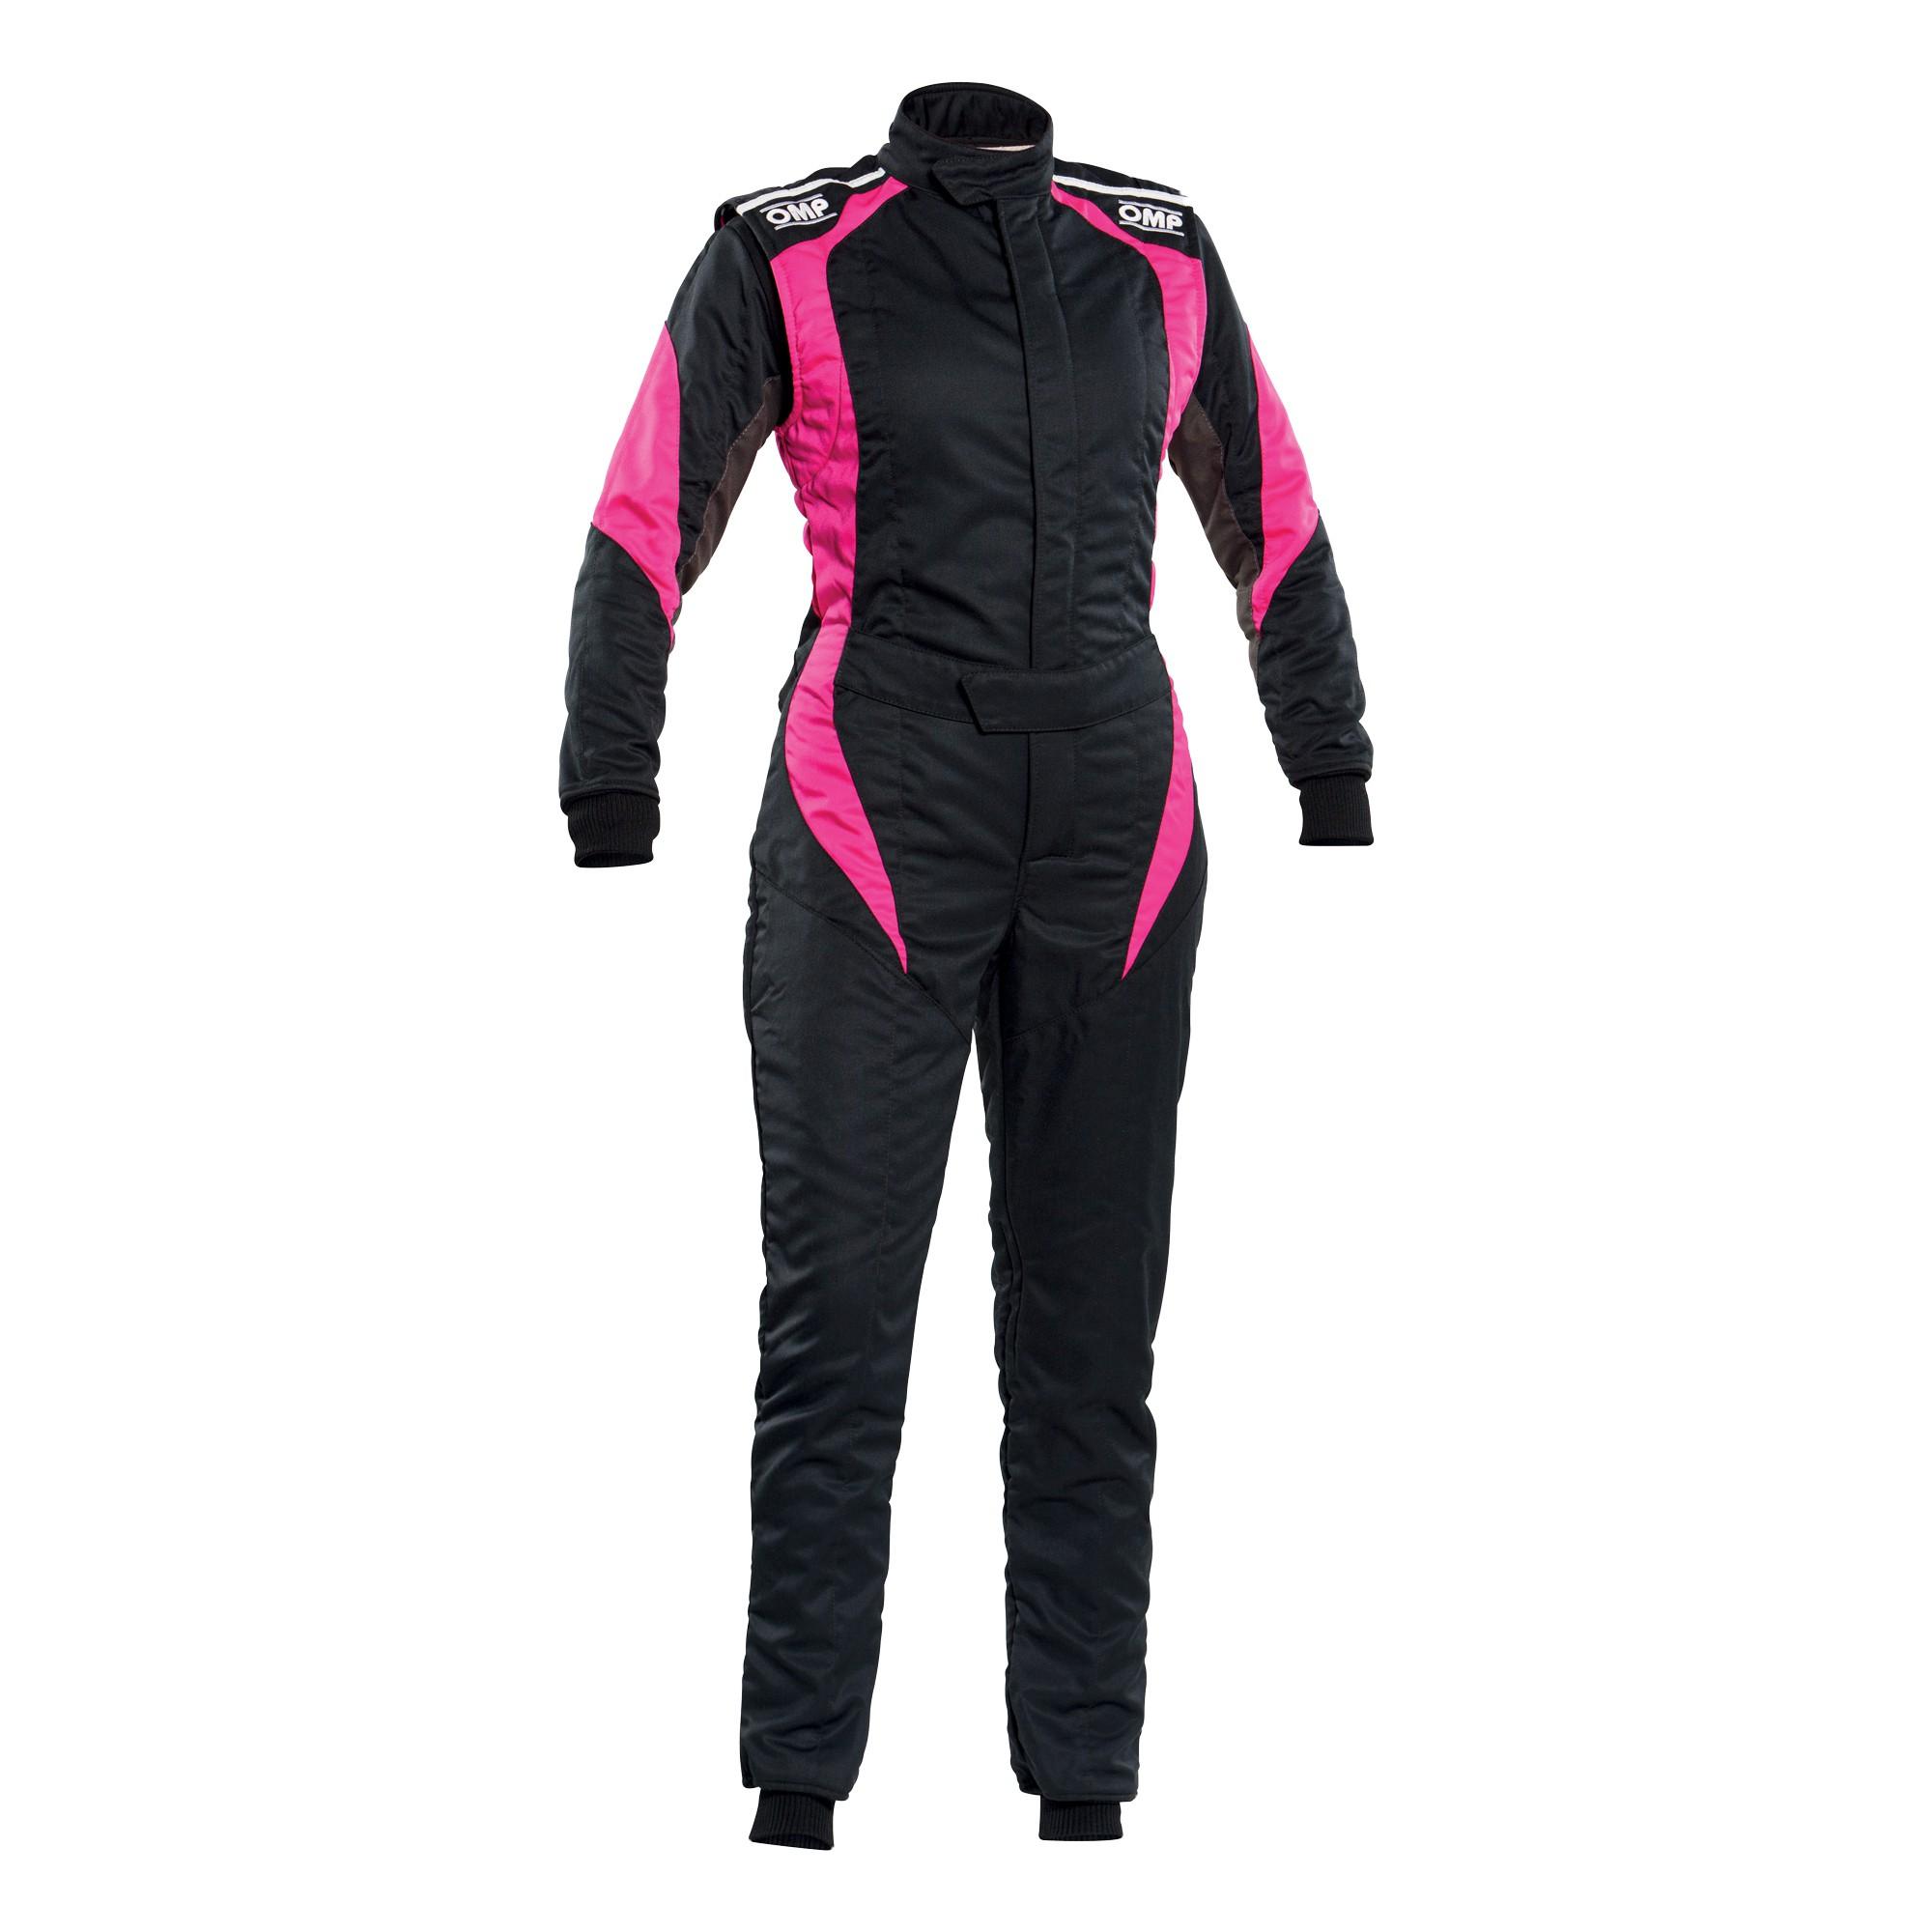 FIRST ELLE OVERALL BLACK/FUCHSIA SZ. 38 FOR WOMEN - FIA 8856-2018